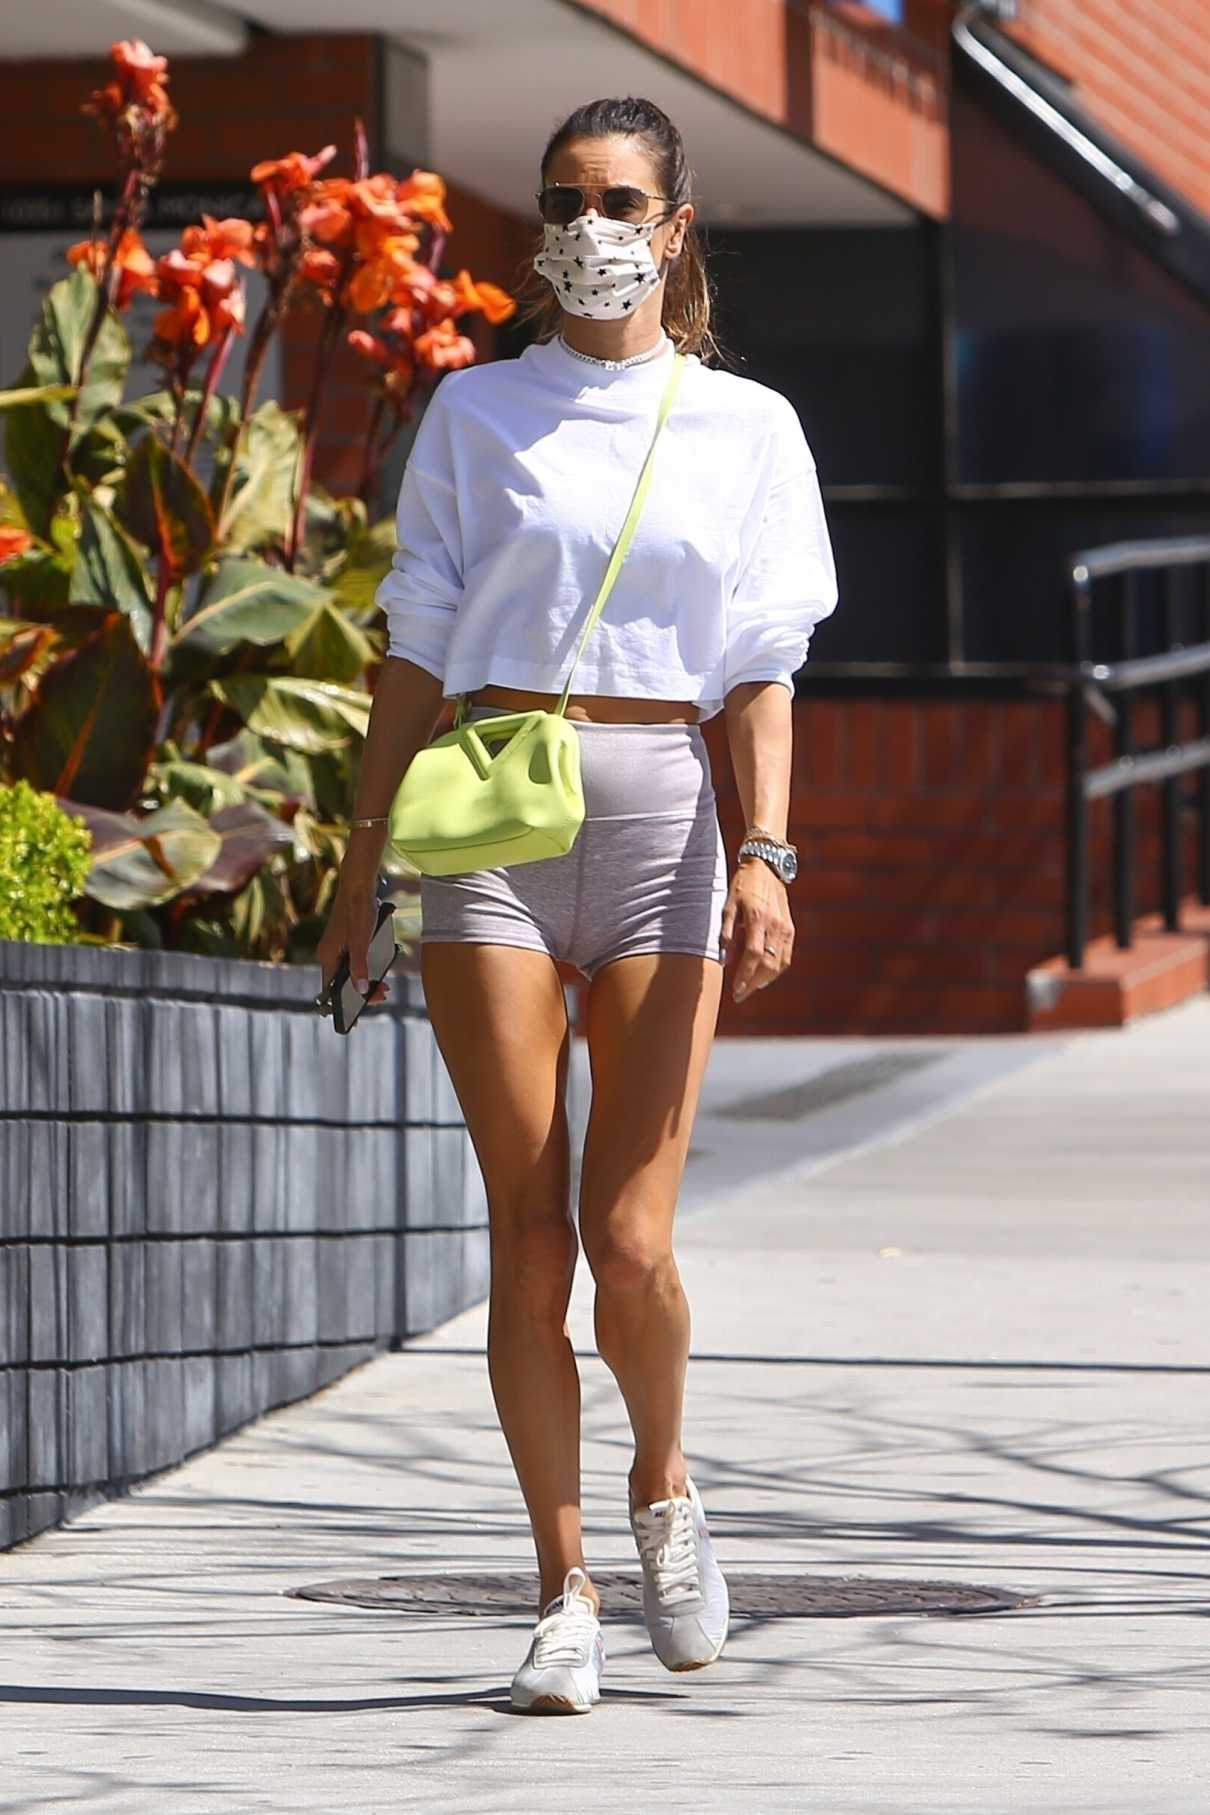 Alessandra Ambrosio in a Grey Spandex Shorts